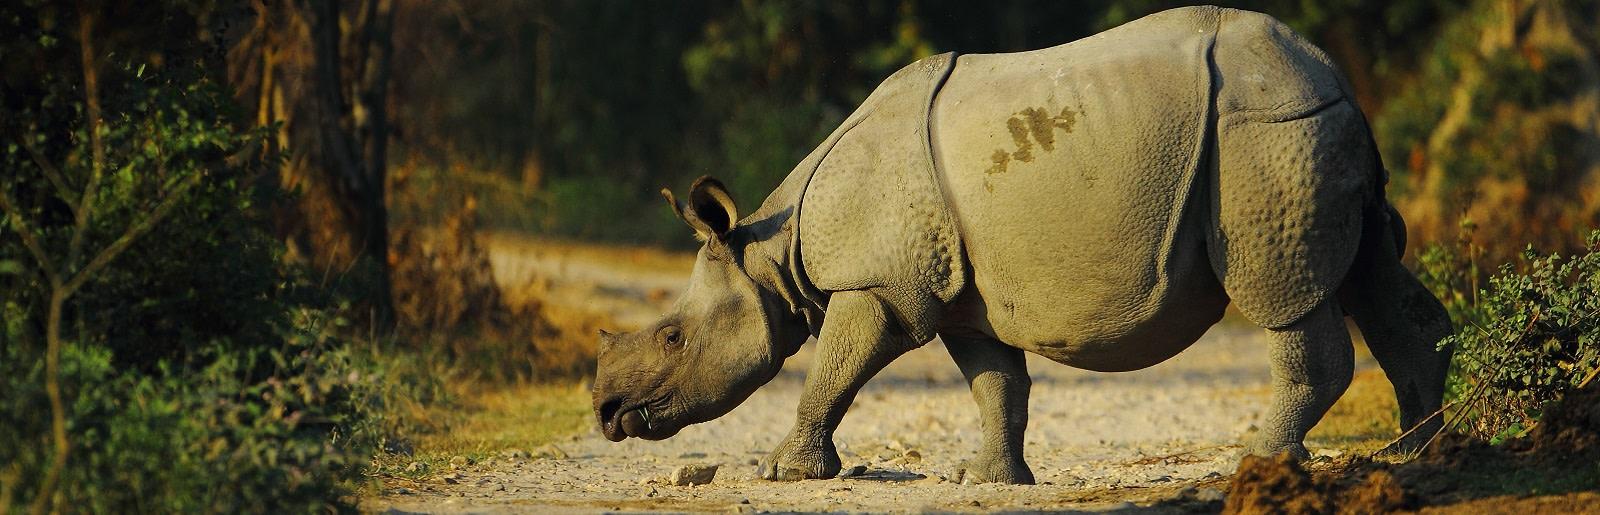 Enchanting Travels India Tours East India Indian one horned rhino in Kaziranga National Park of Assam in India